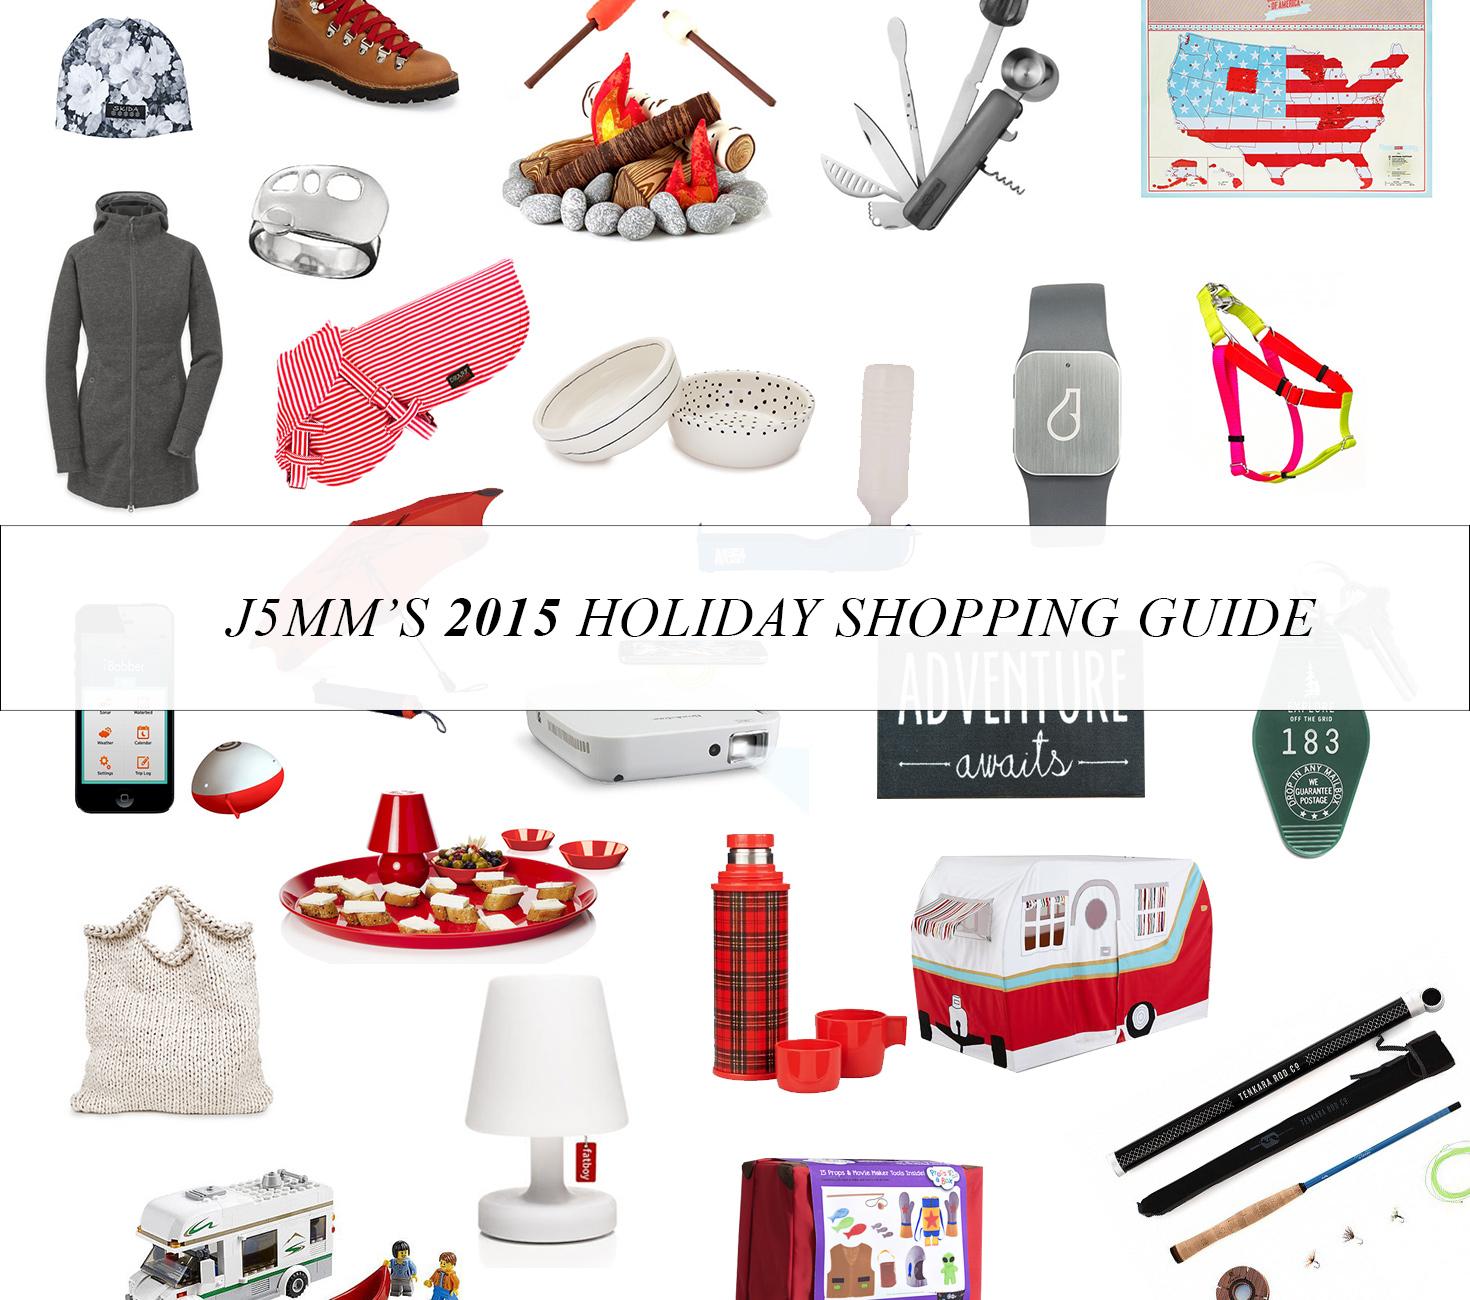 RVing Inspired Holiday Gift Guide via J5MM.com